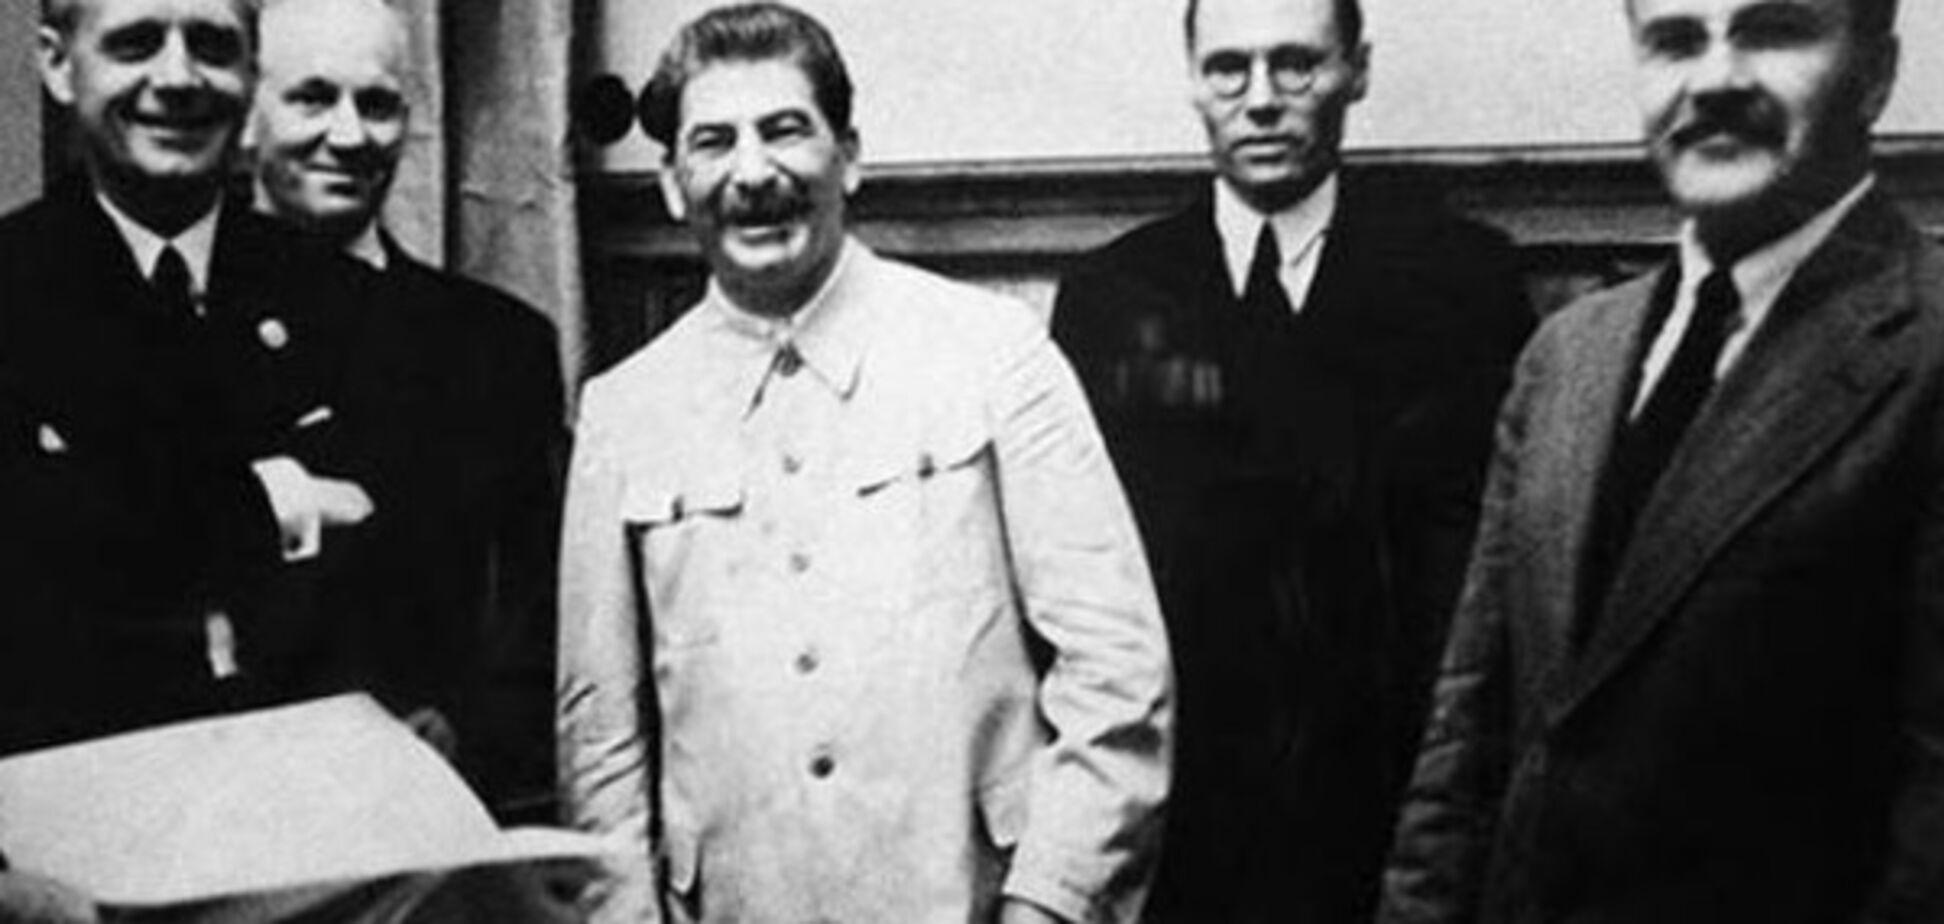 Риббентроп, Сталин, Молотов в Кремле 23 августа 1939 г.